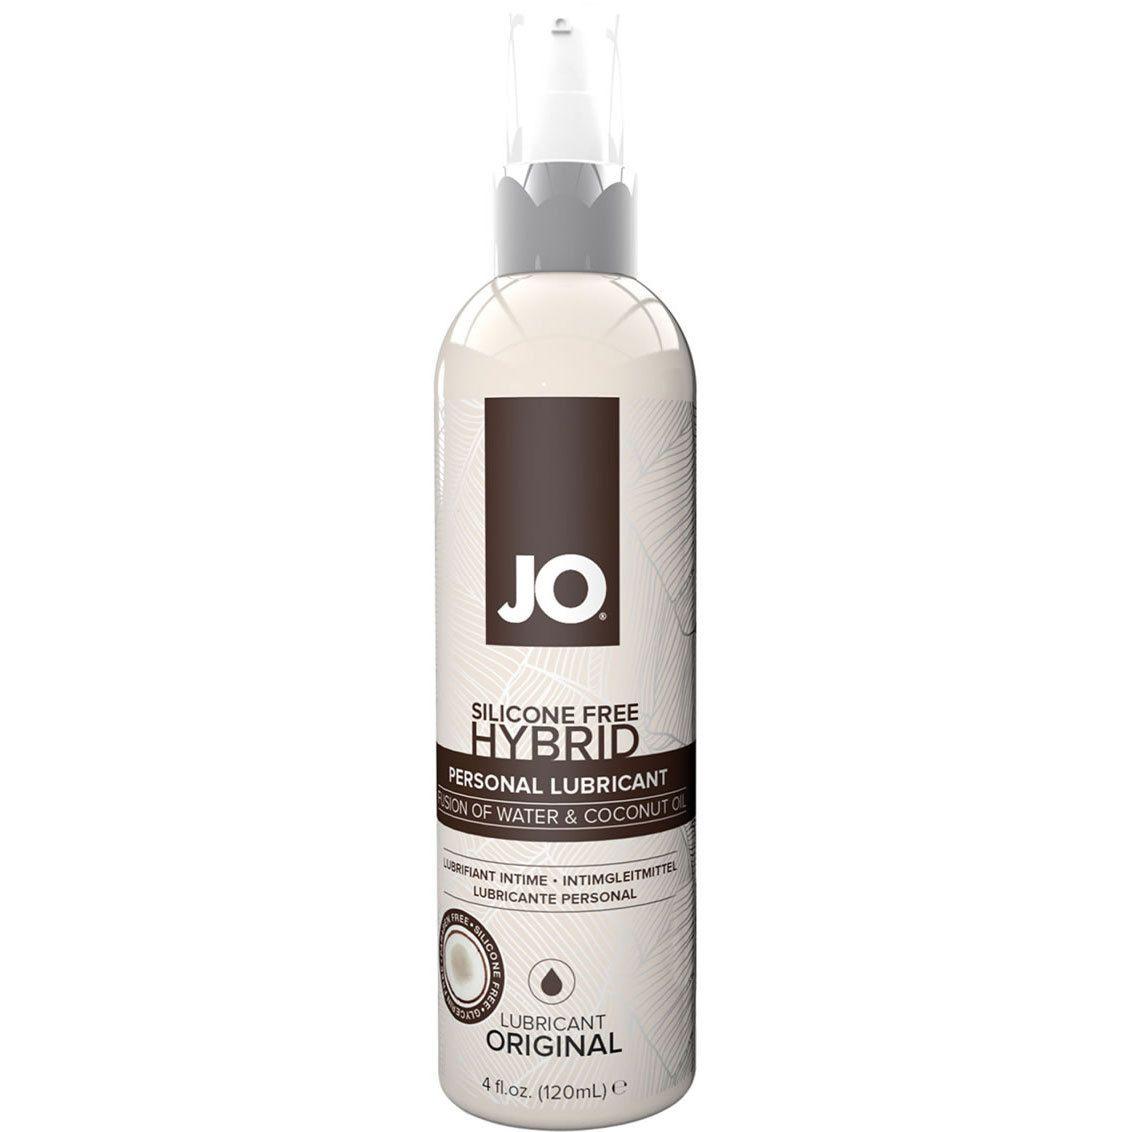 System Jo Silicone Free Hybrid Original Coconut Lubricant 4 Oz